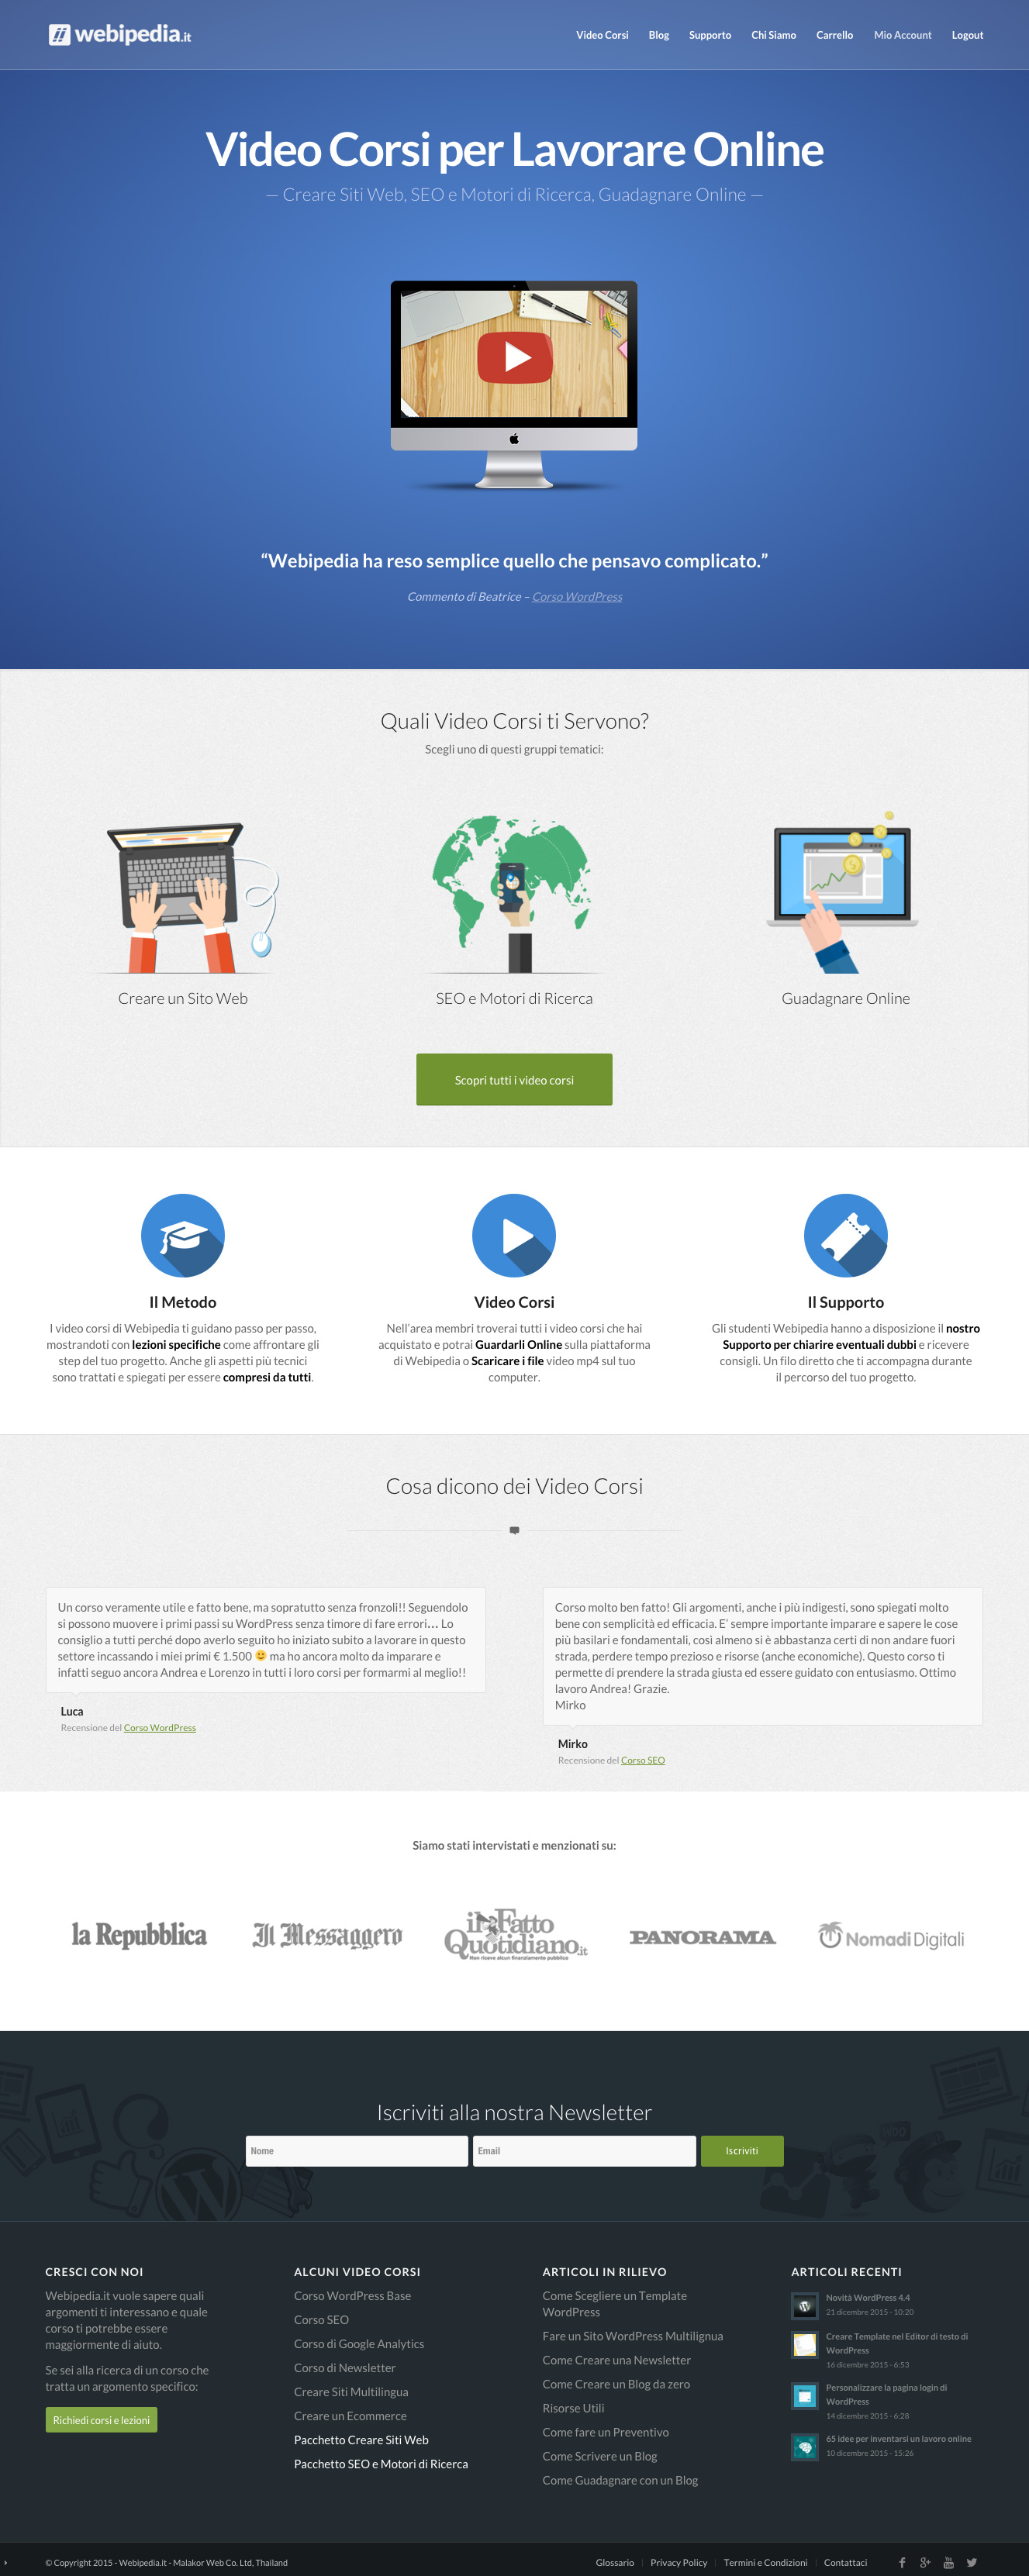 Webipedia.it: Video Corsi Online